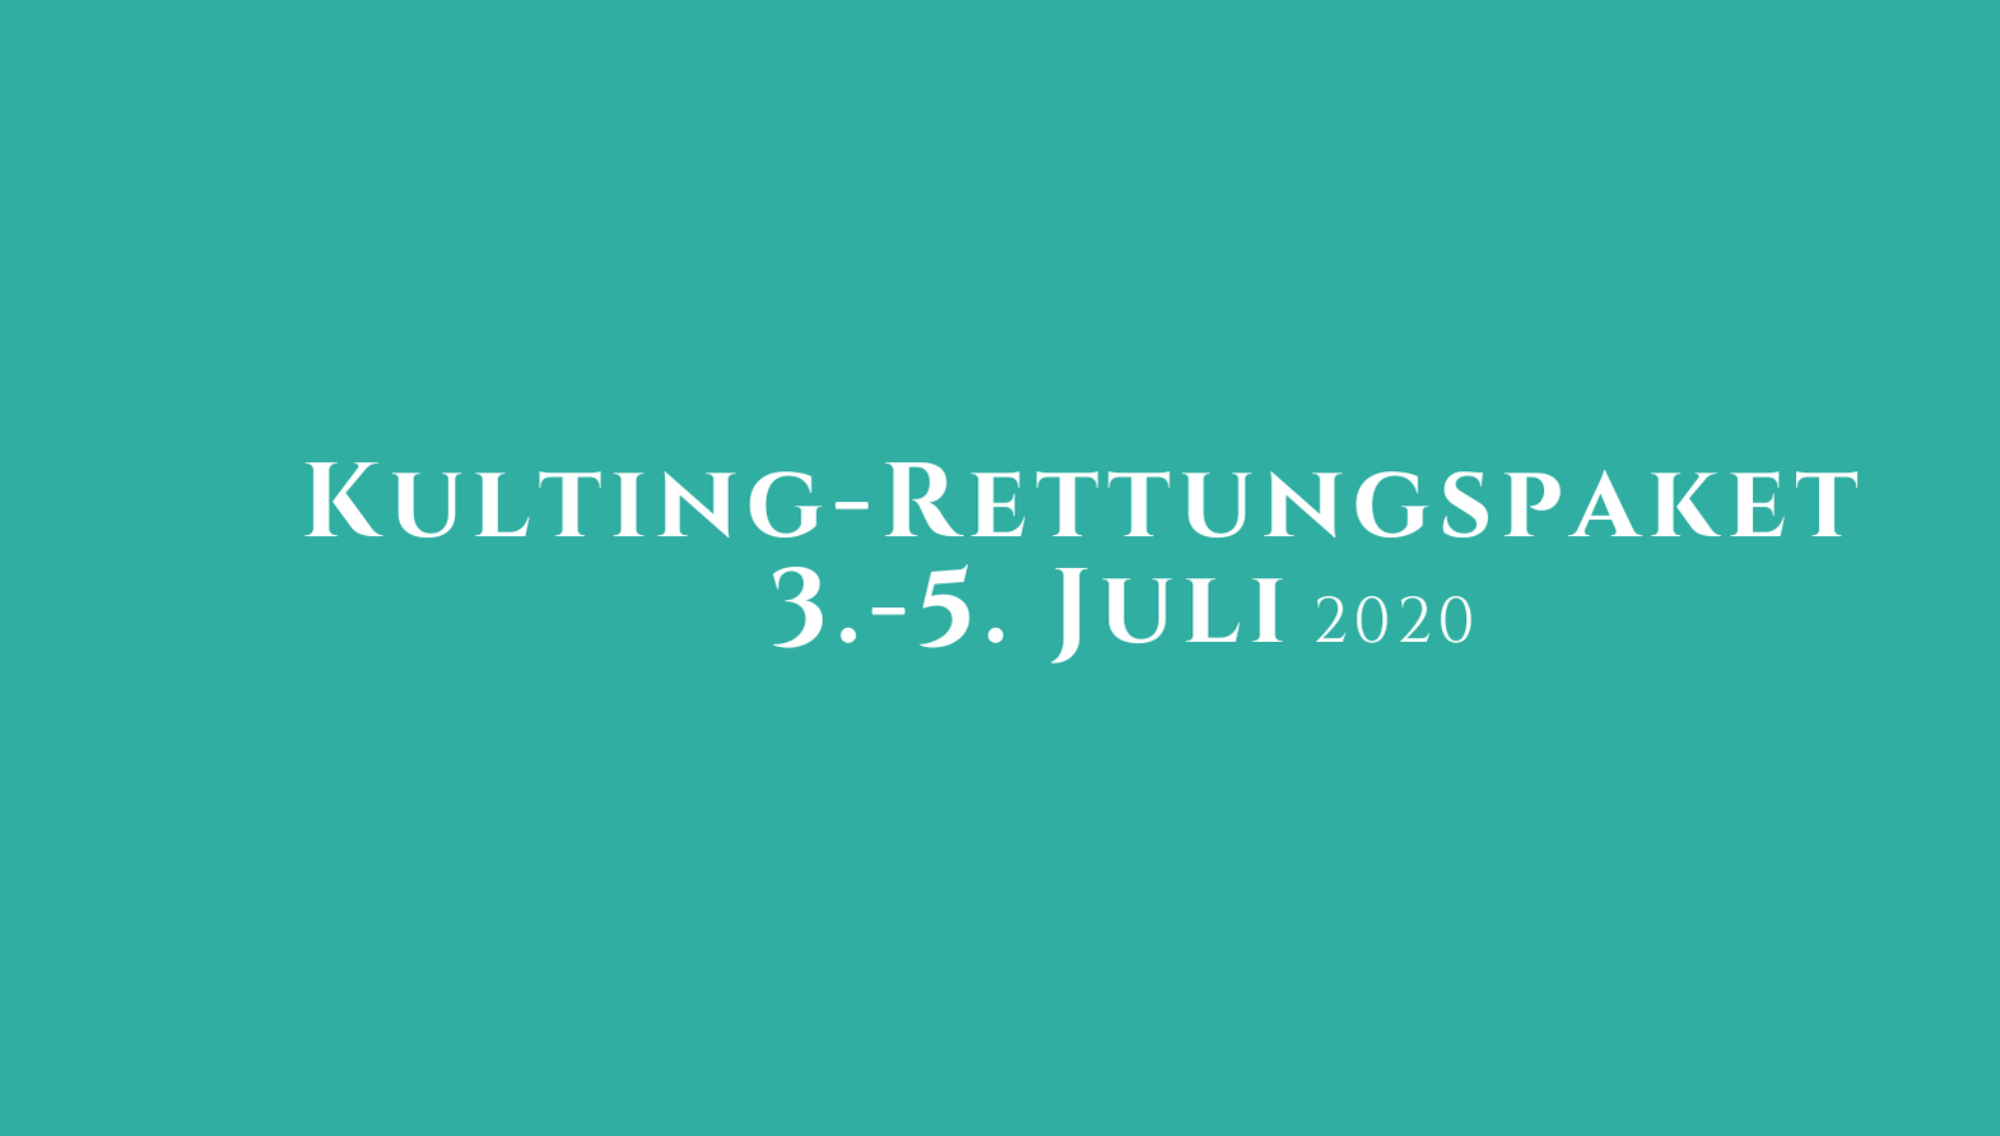 Kulting-Rettungspaket 2020